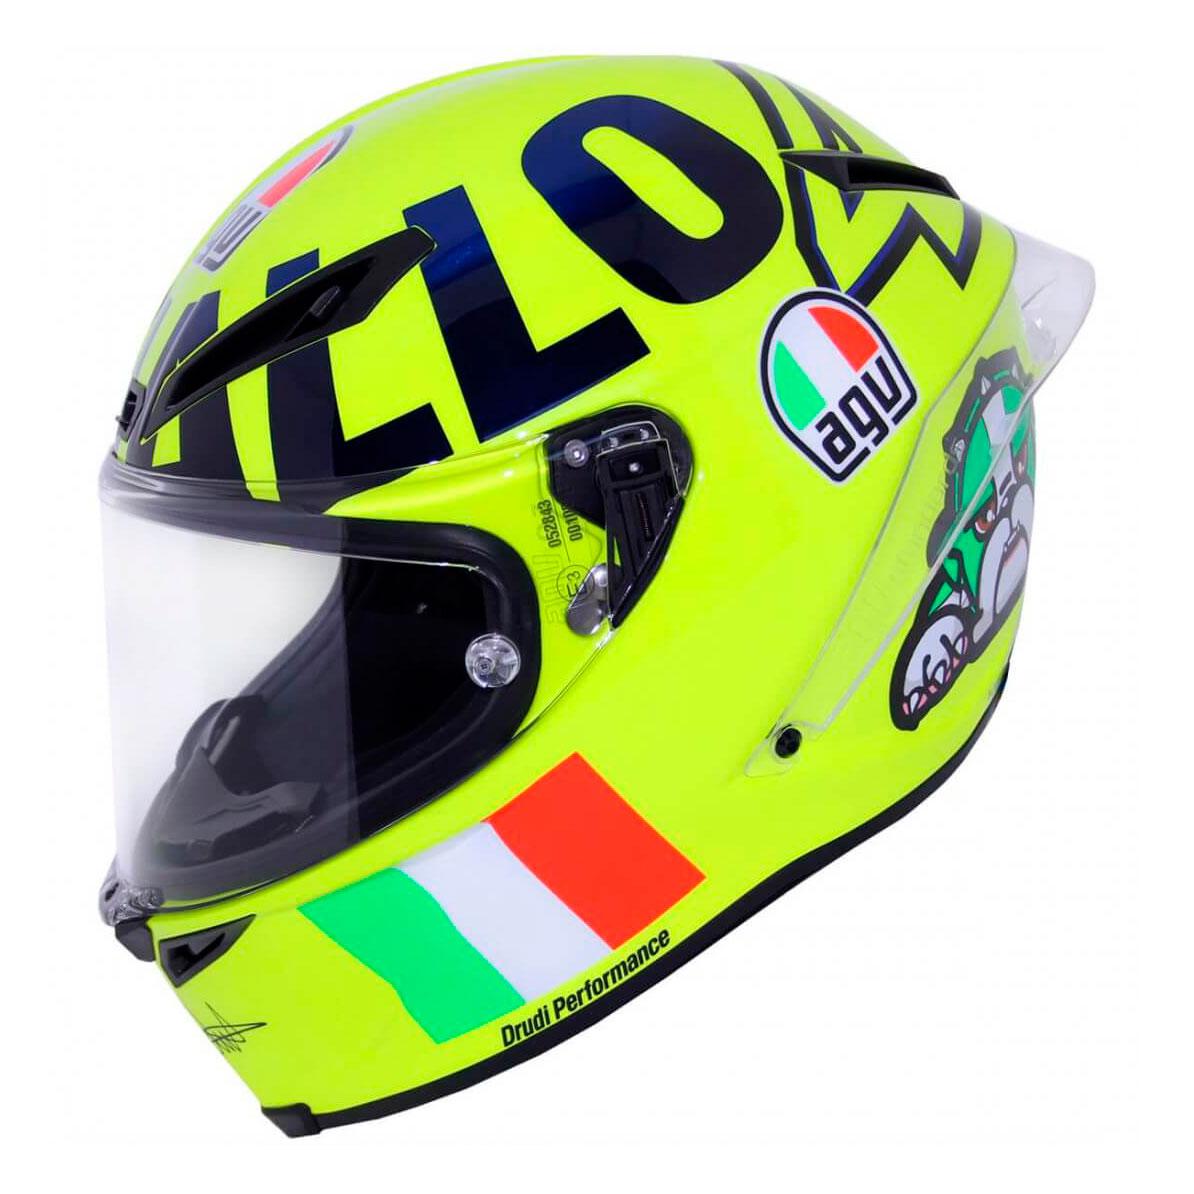 Casco AGV Corsa R Rossi Mugello Pinlock en Motorbike Store 09652c0561d